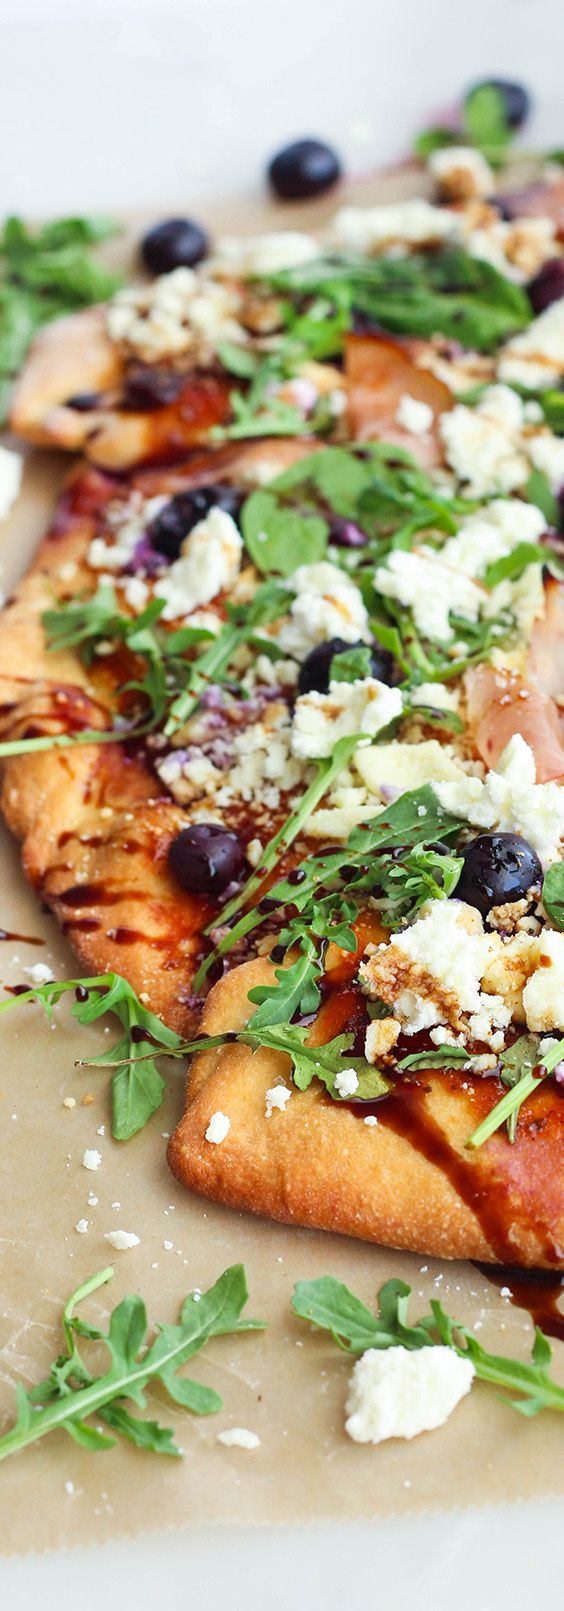 BBQ Feta & Blueberry Flatbread w/ Honey Balsamic Drizzle  @KristiePryor